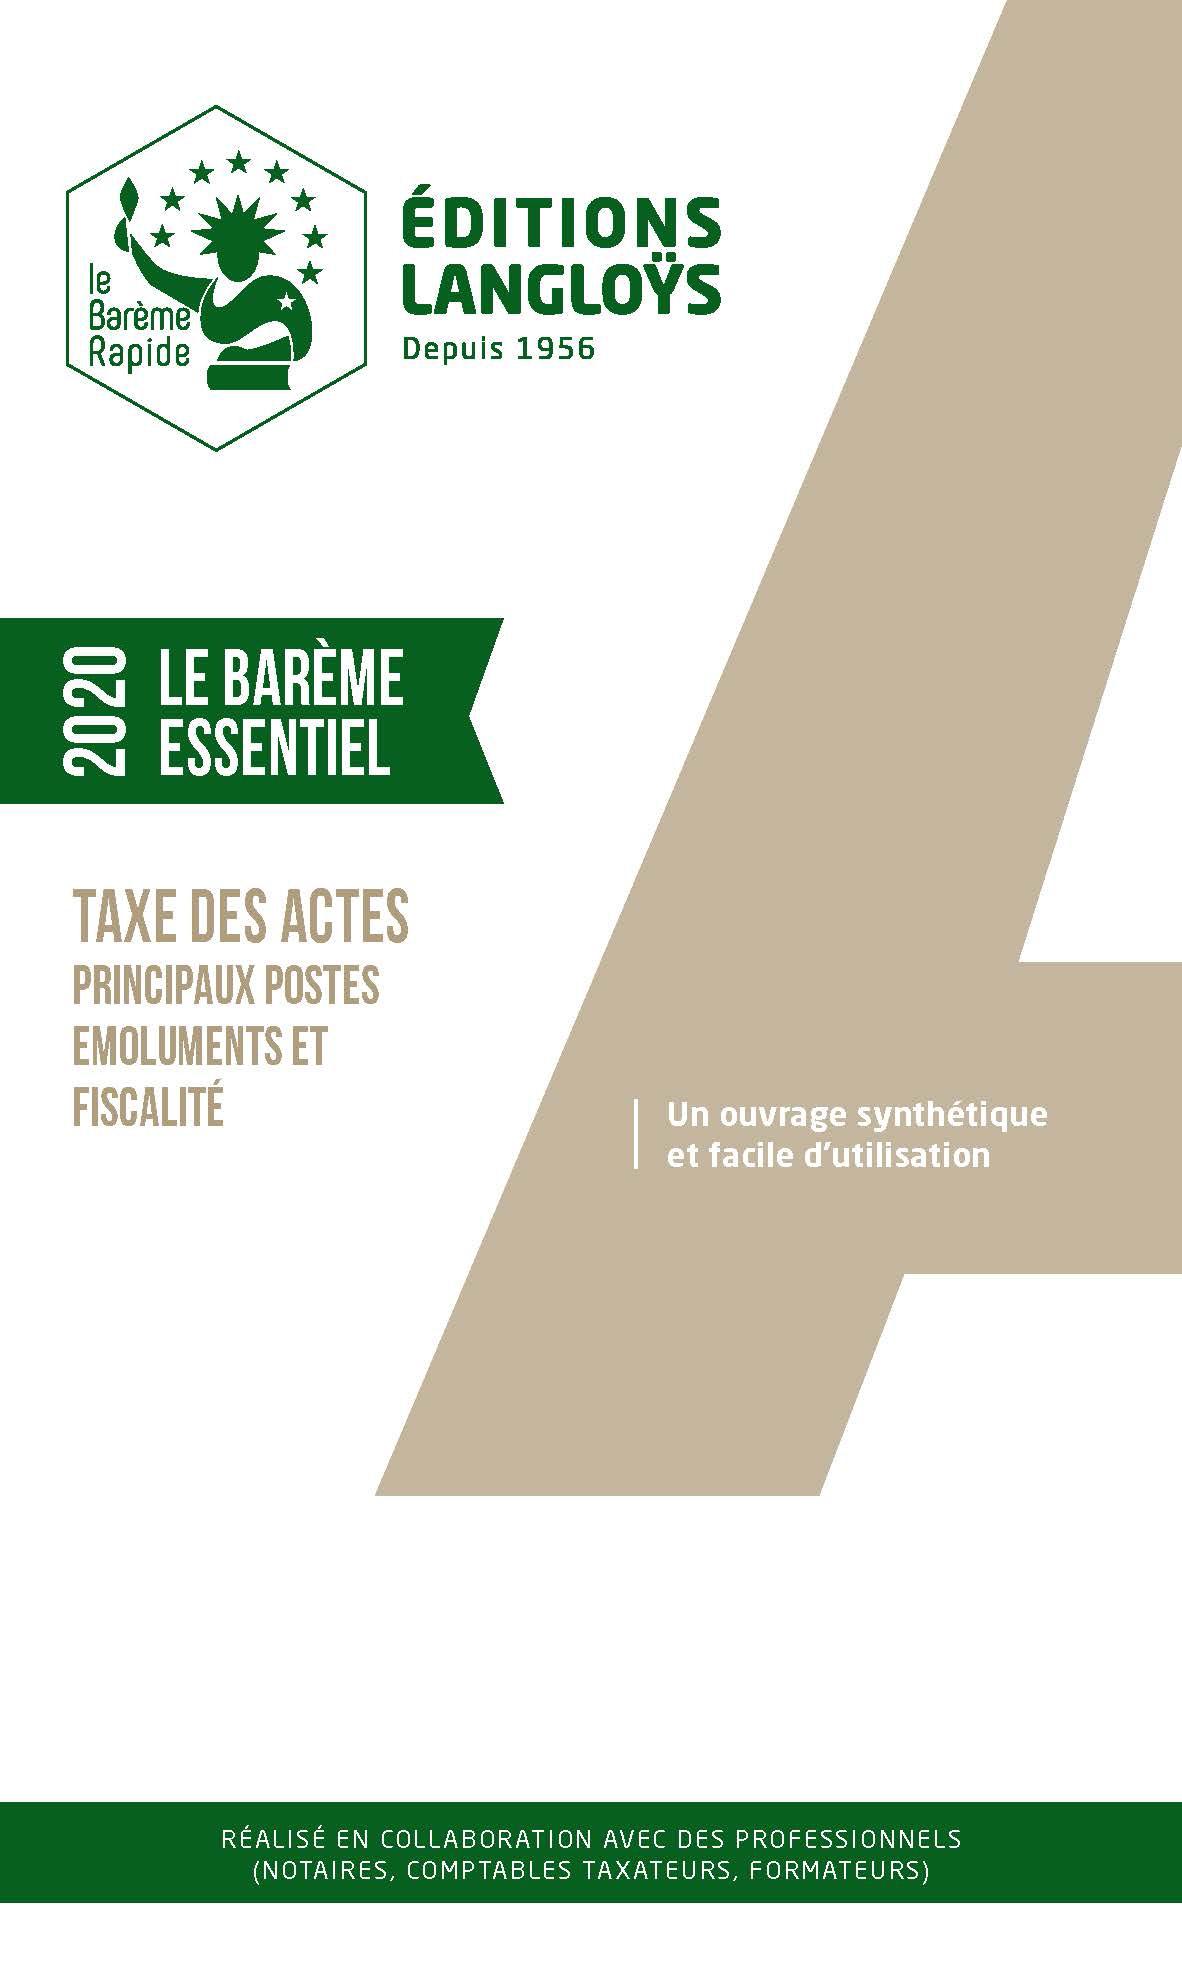 Barème Essentiel 2020